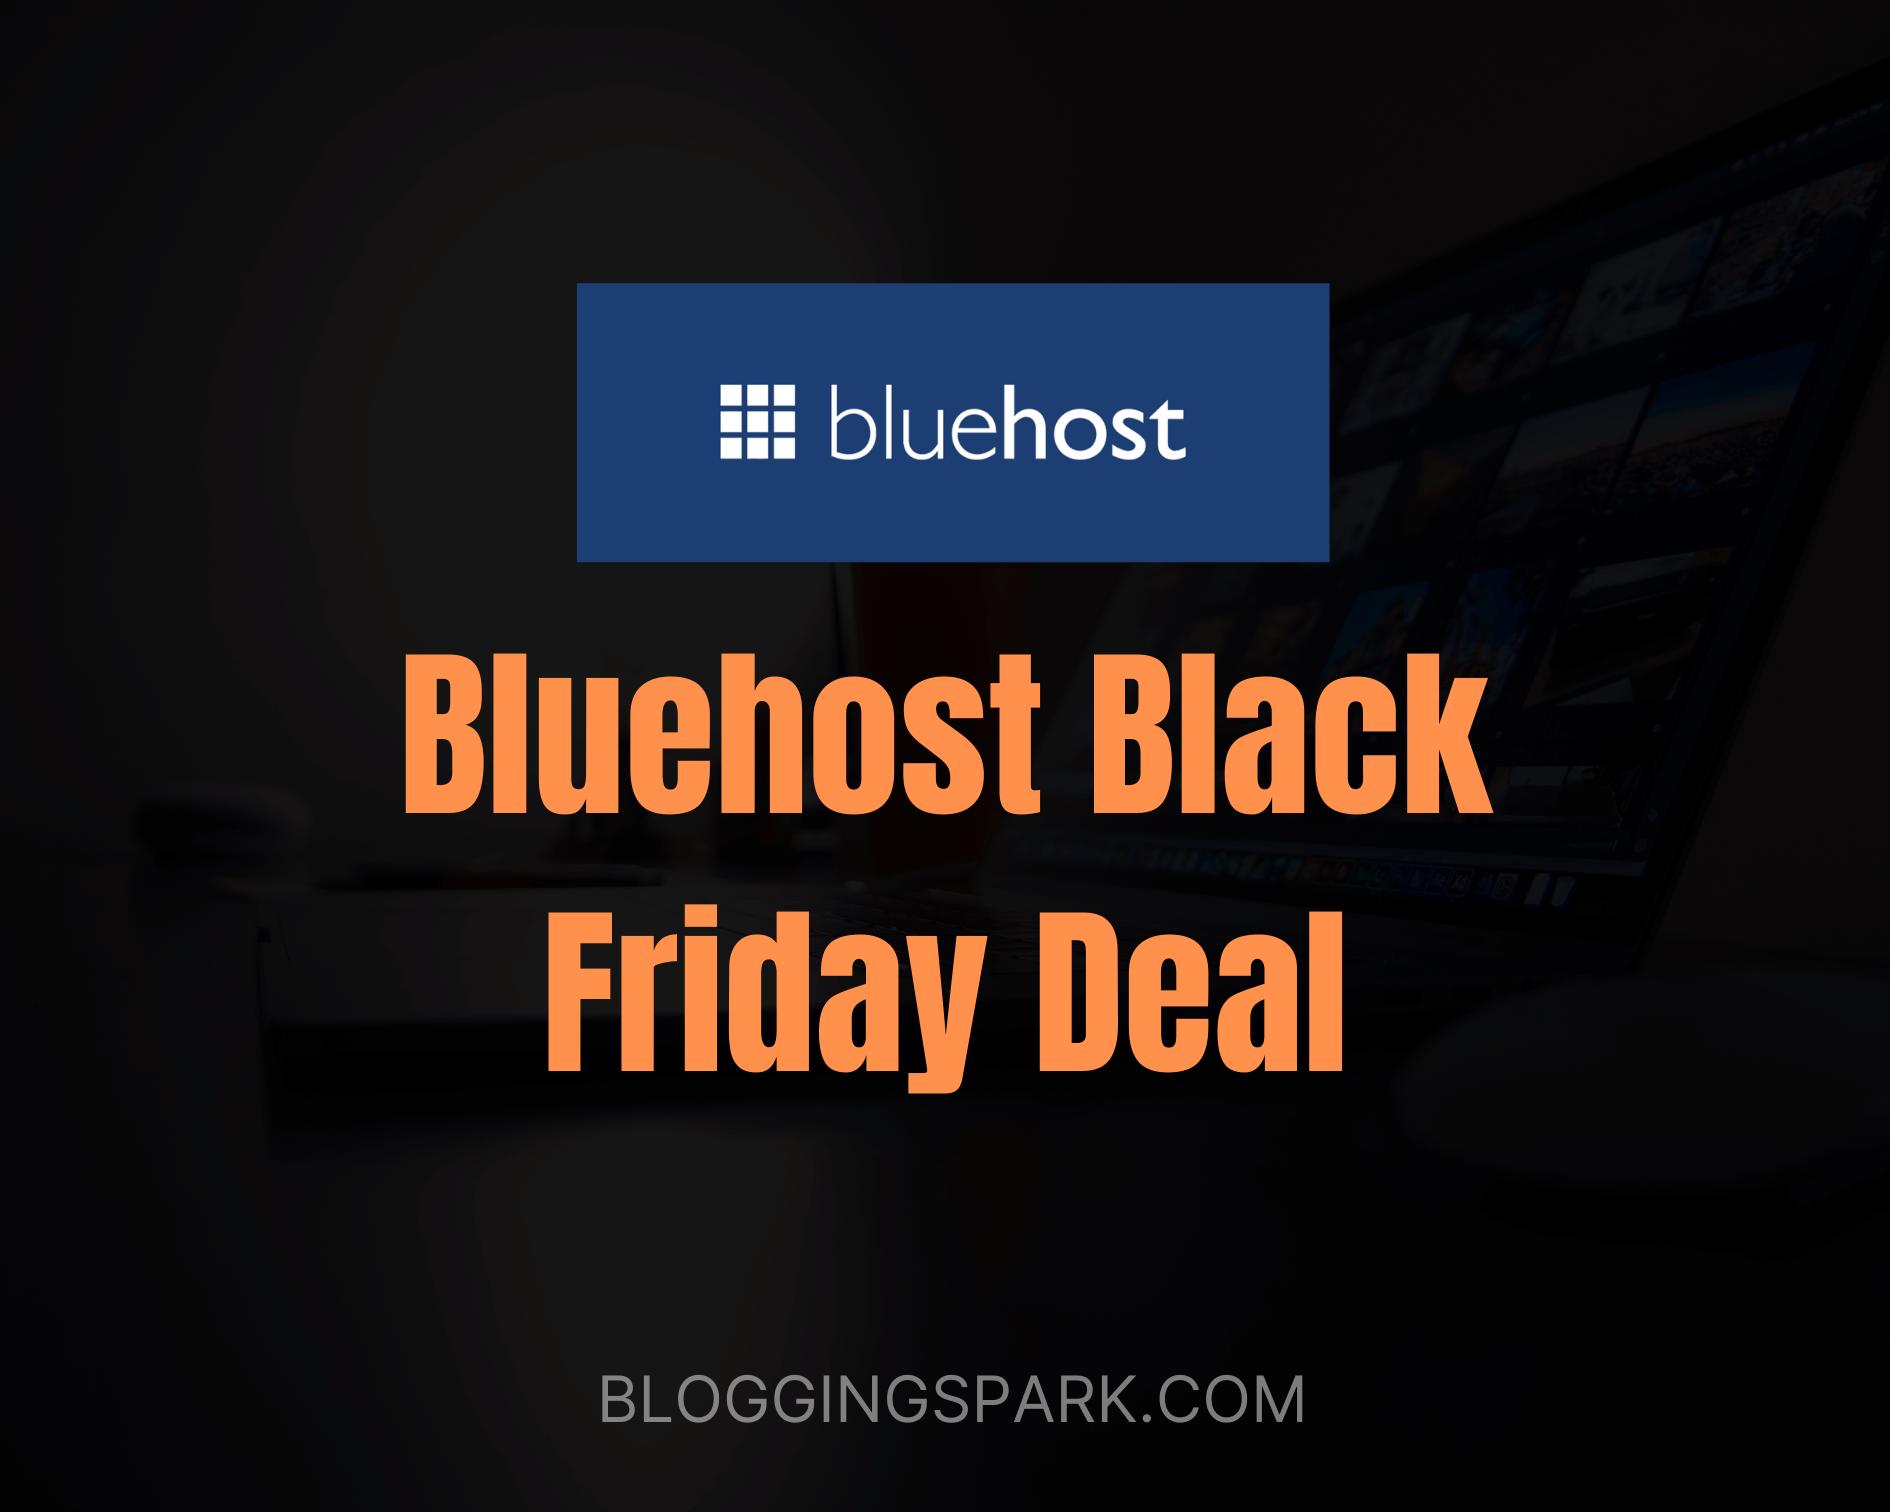 Bluehost Black Friday Deal 2020: Get Flat 70% Discount